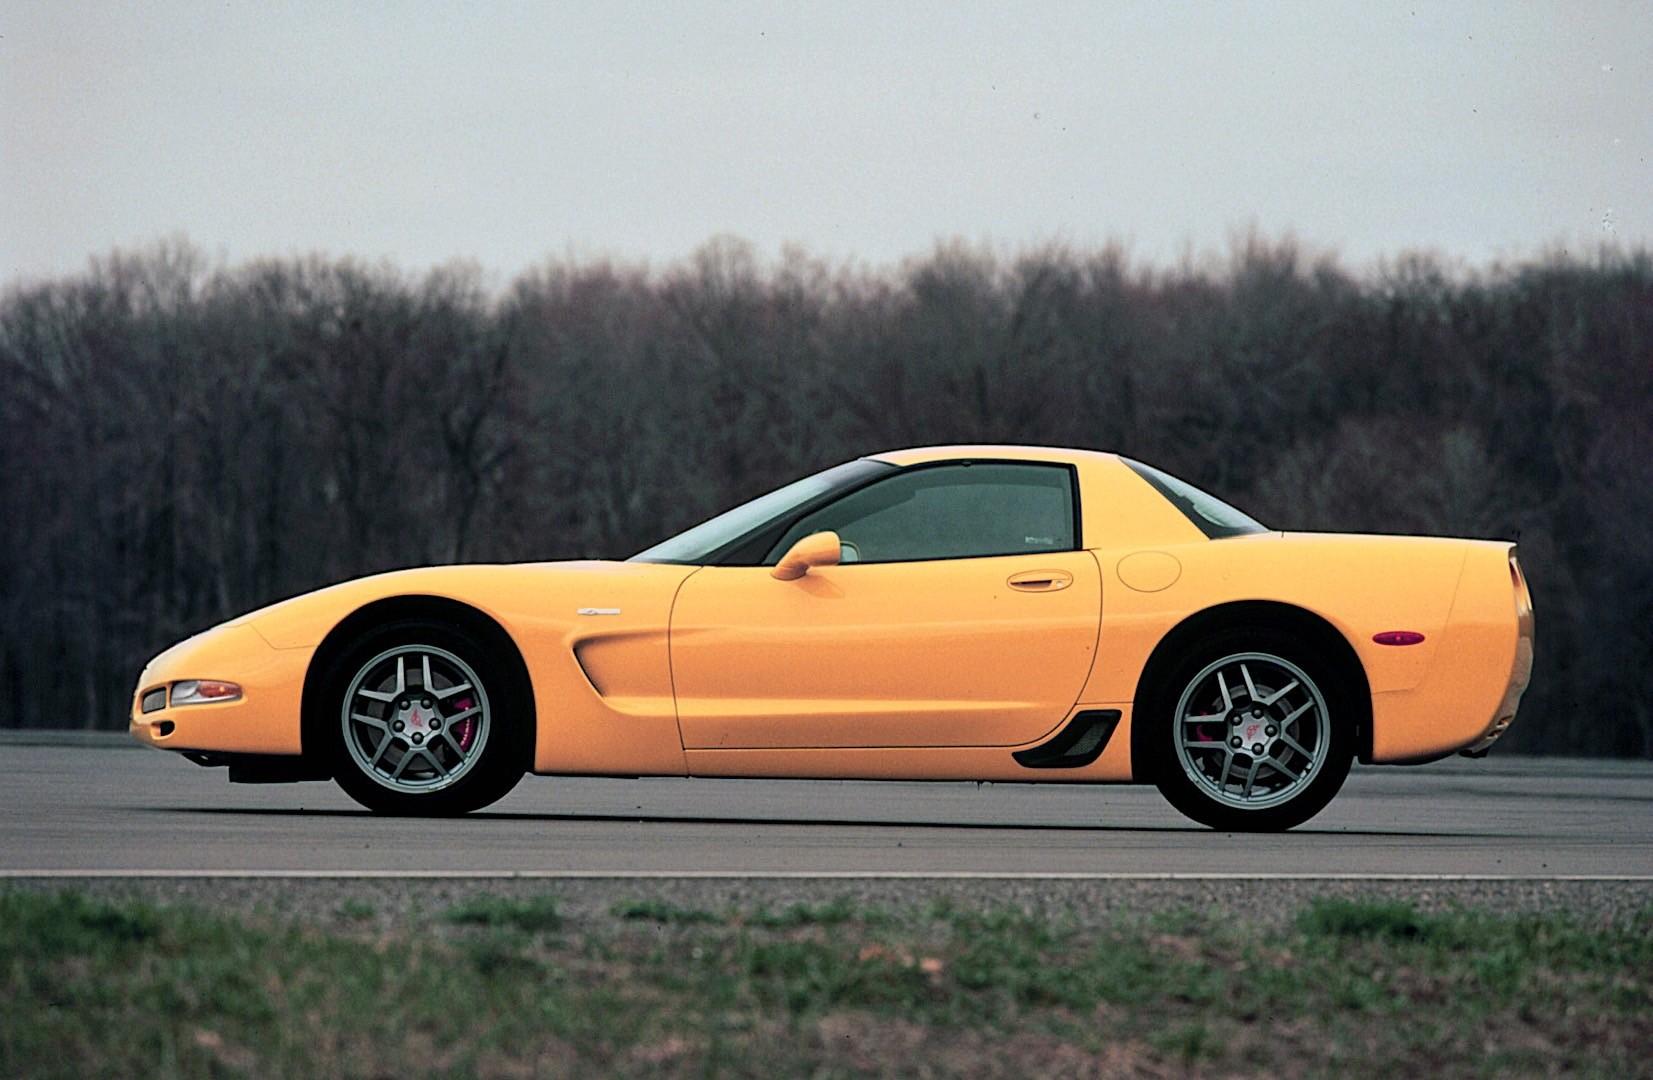 Silverado Towing Capacity >> CHEVROLET Corvette C5 Z06 specs & photos - 2001, 2002, 2003, 2004 - autoevolution